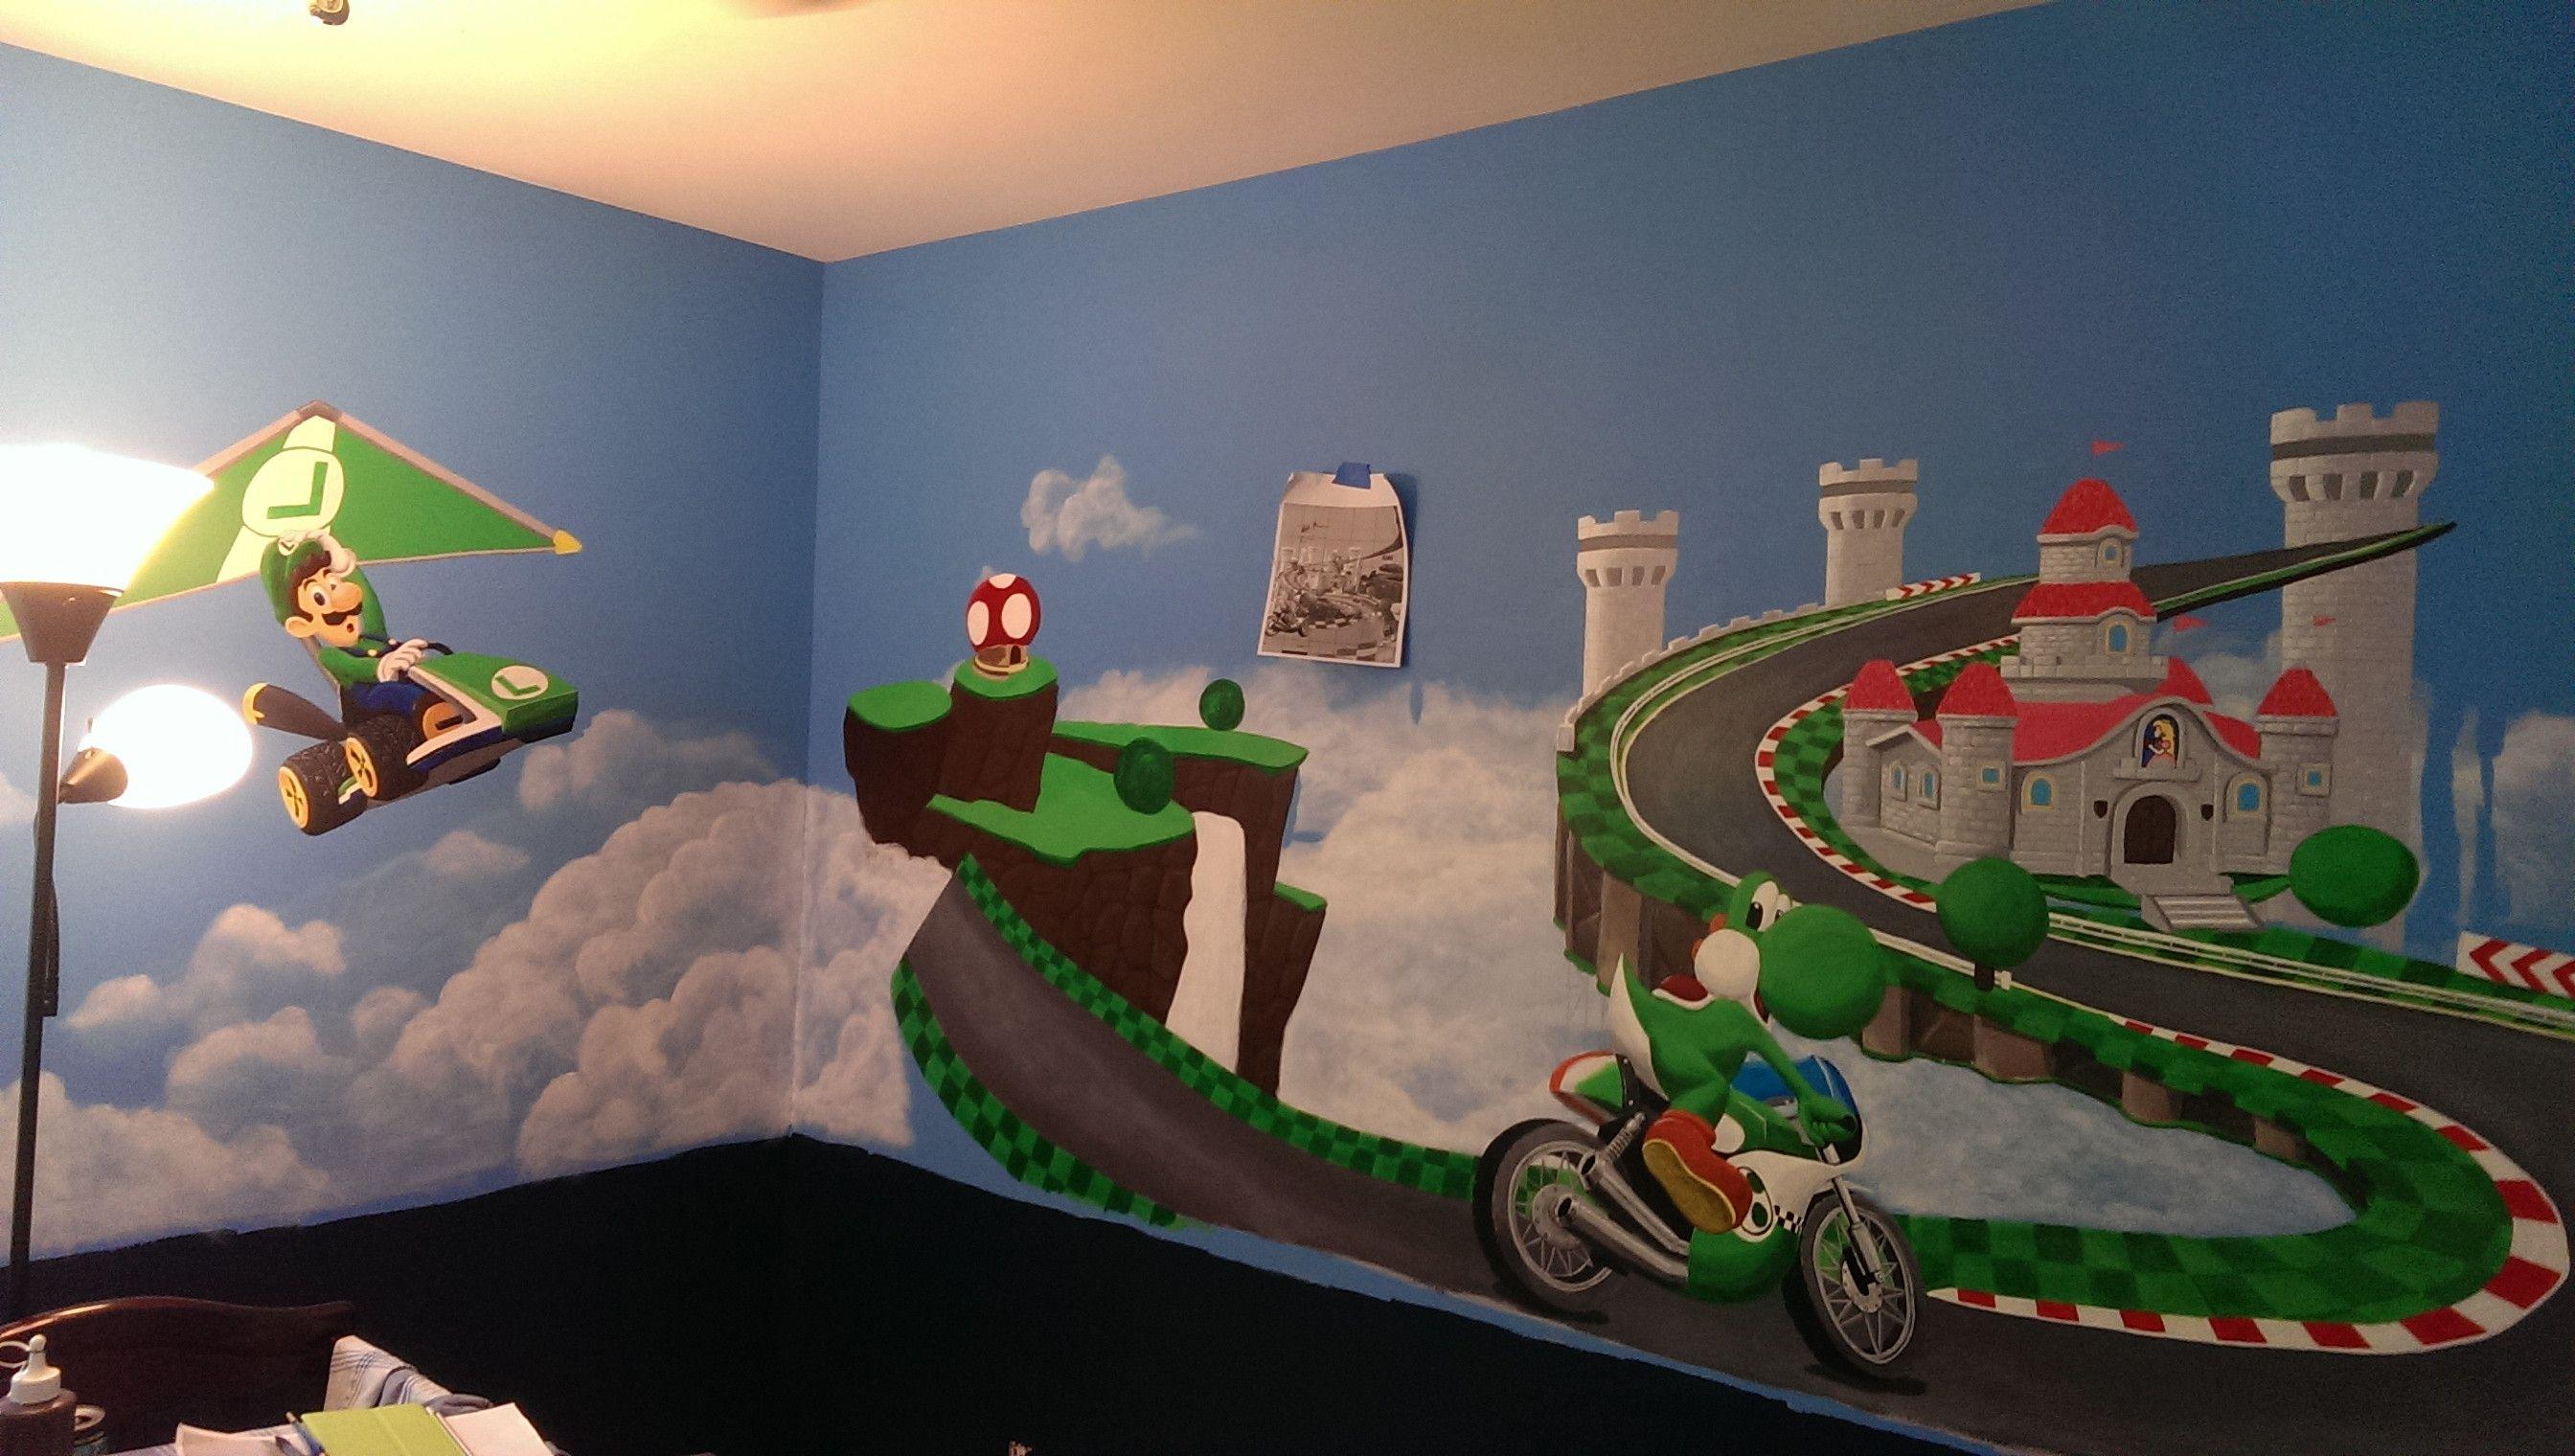 mario kart bedroom room decor - Google Search   Home design ideas ...